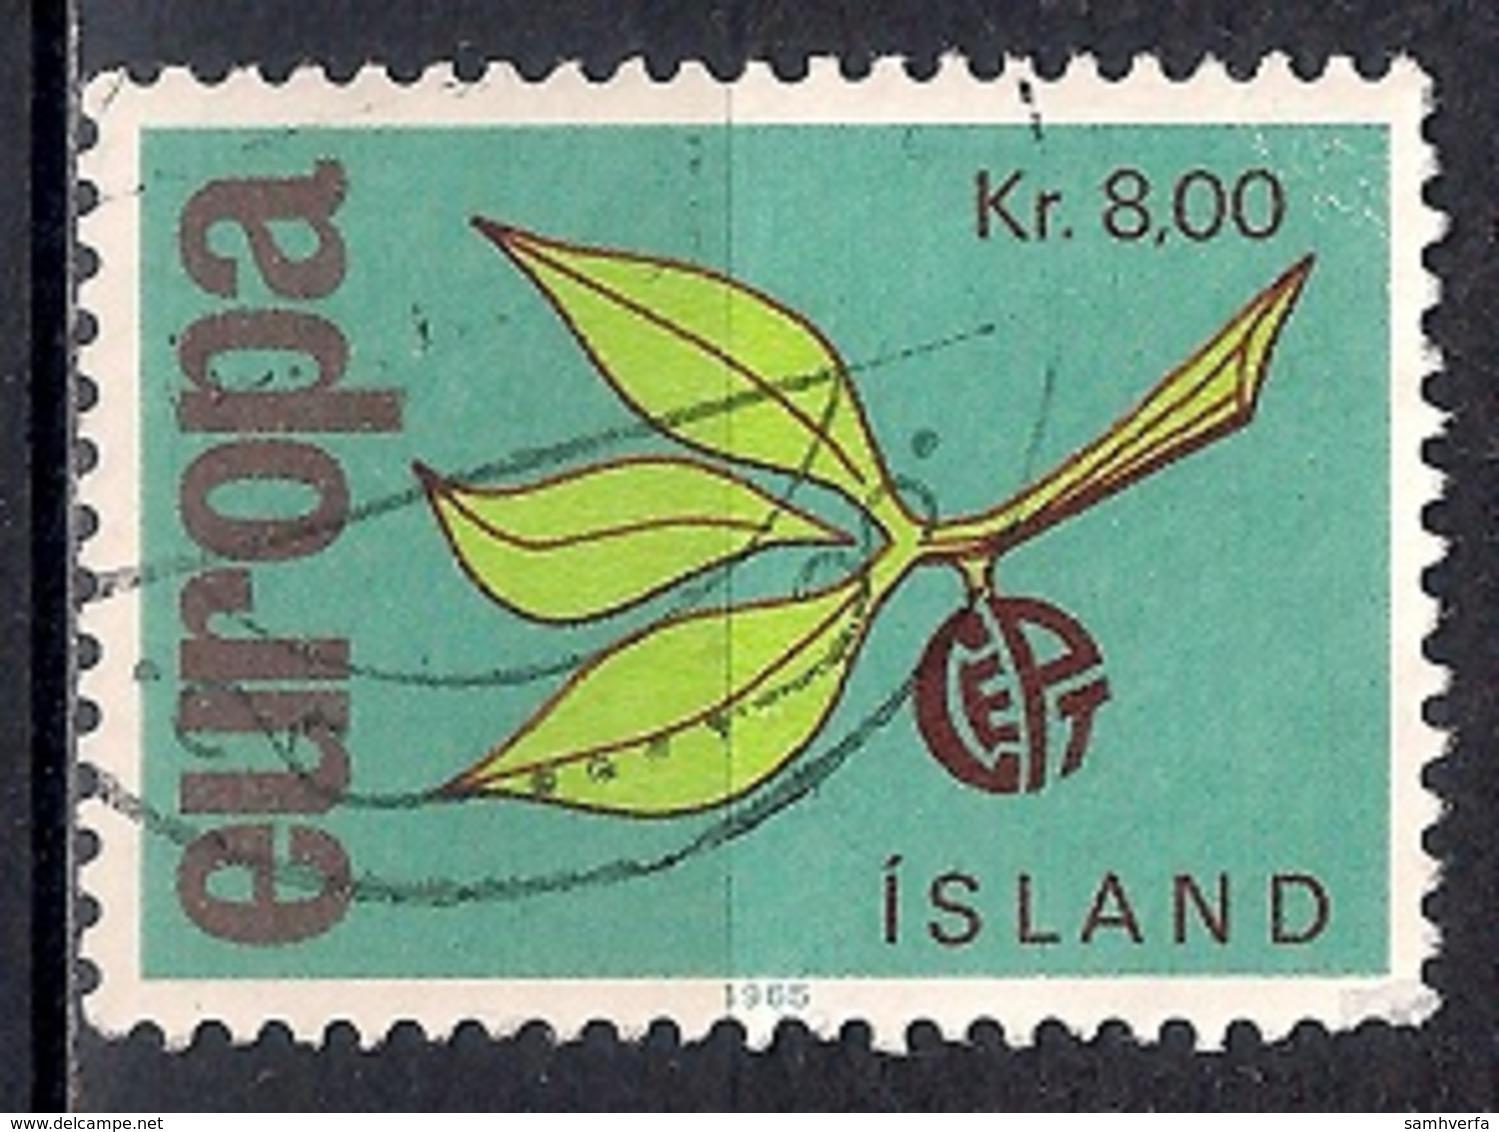 Iceland 1965 - EUROPA Stamps - 1944-... Republik